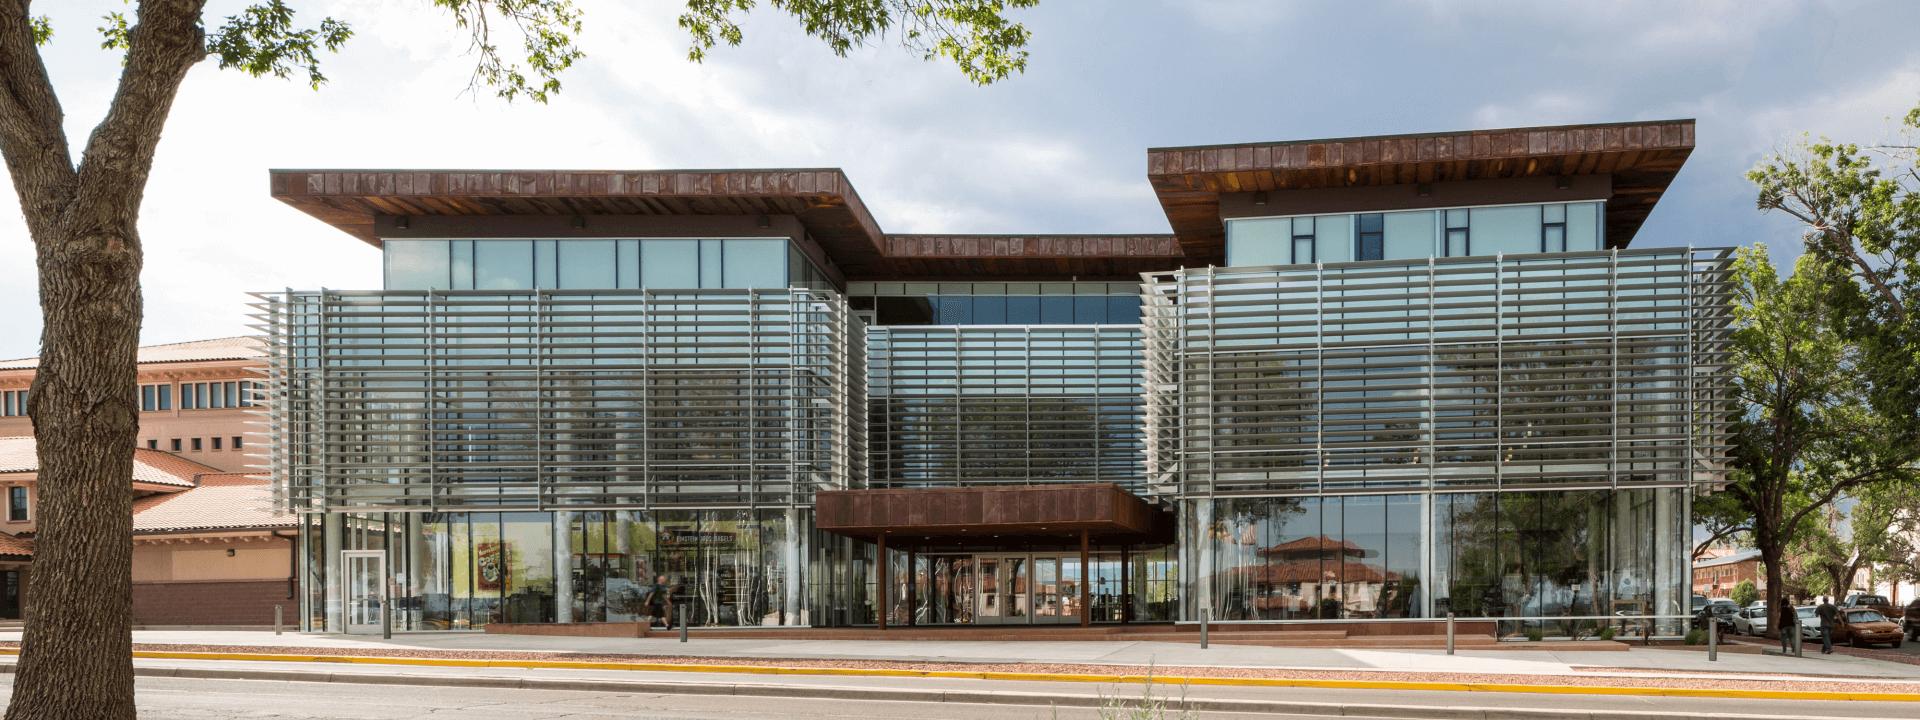 new-mexico-highlands-university